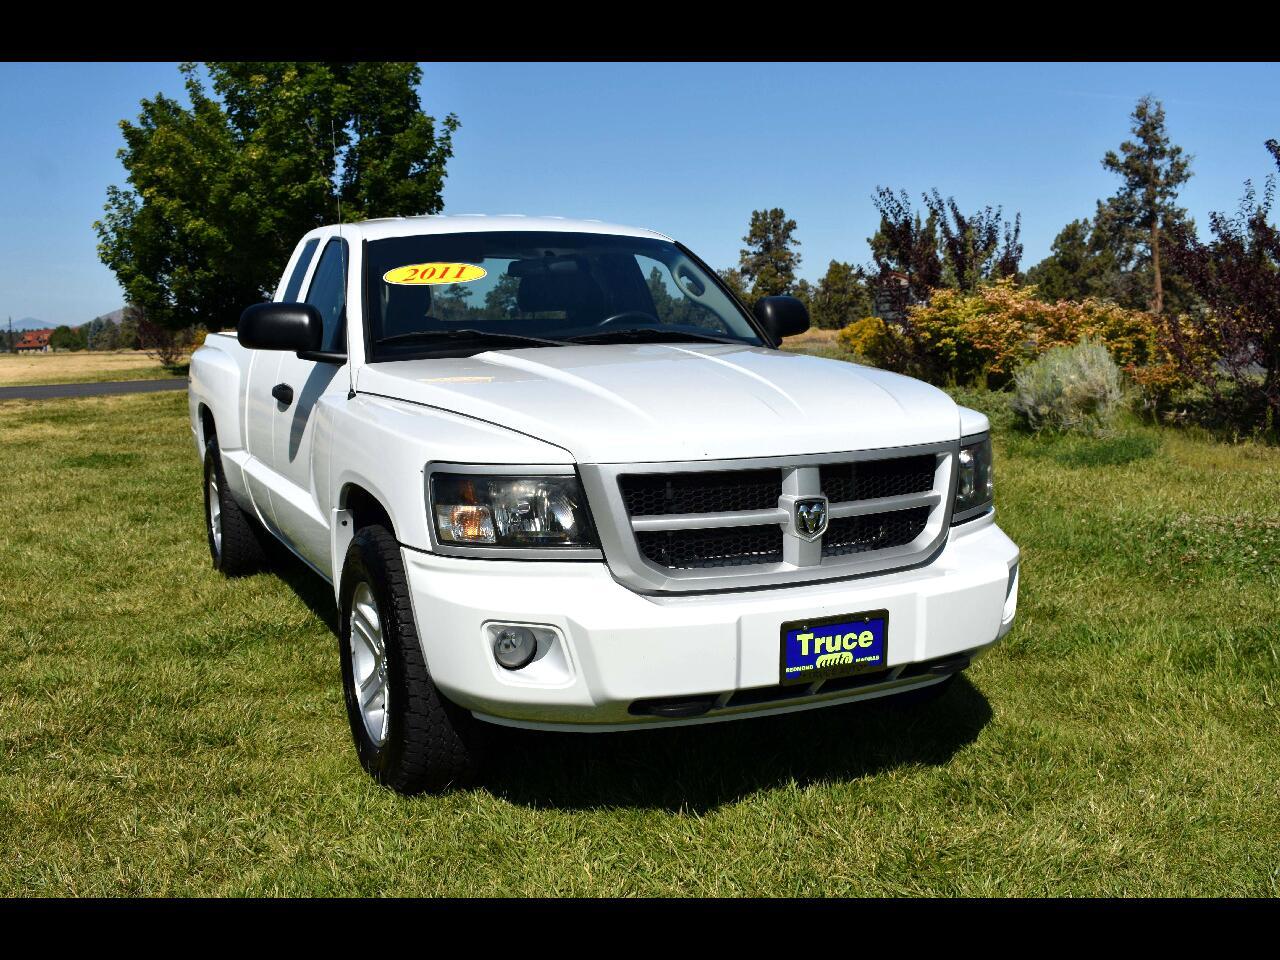 2011 Dodge Dakota 4WD Crew Cab Bighorn/Lonestar 6 1/2' Bed